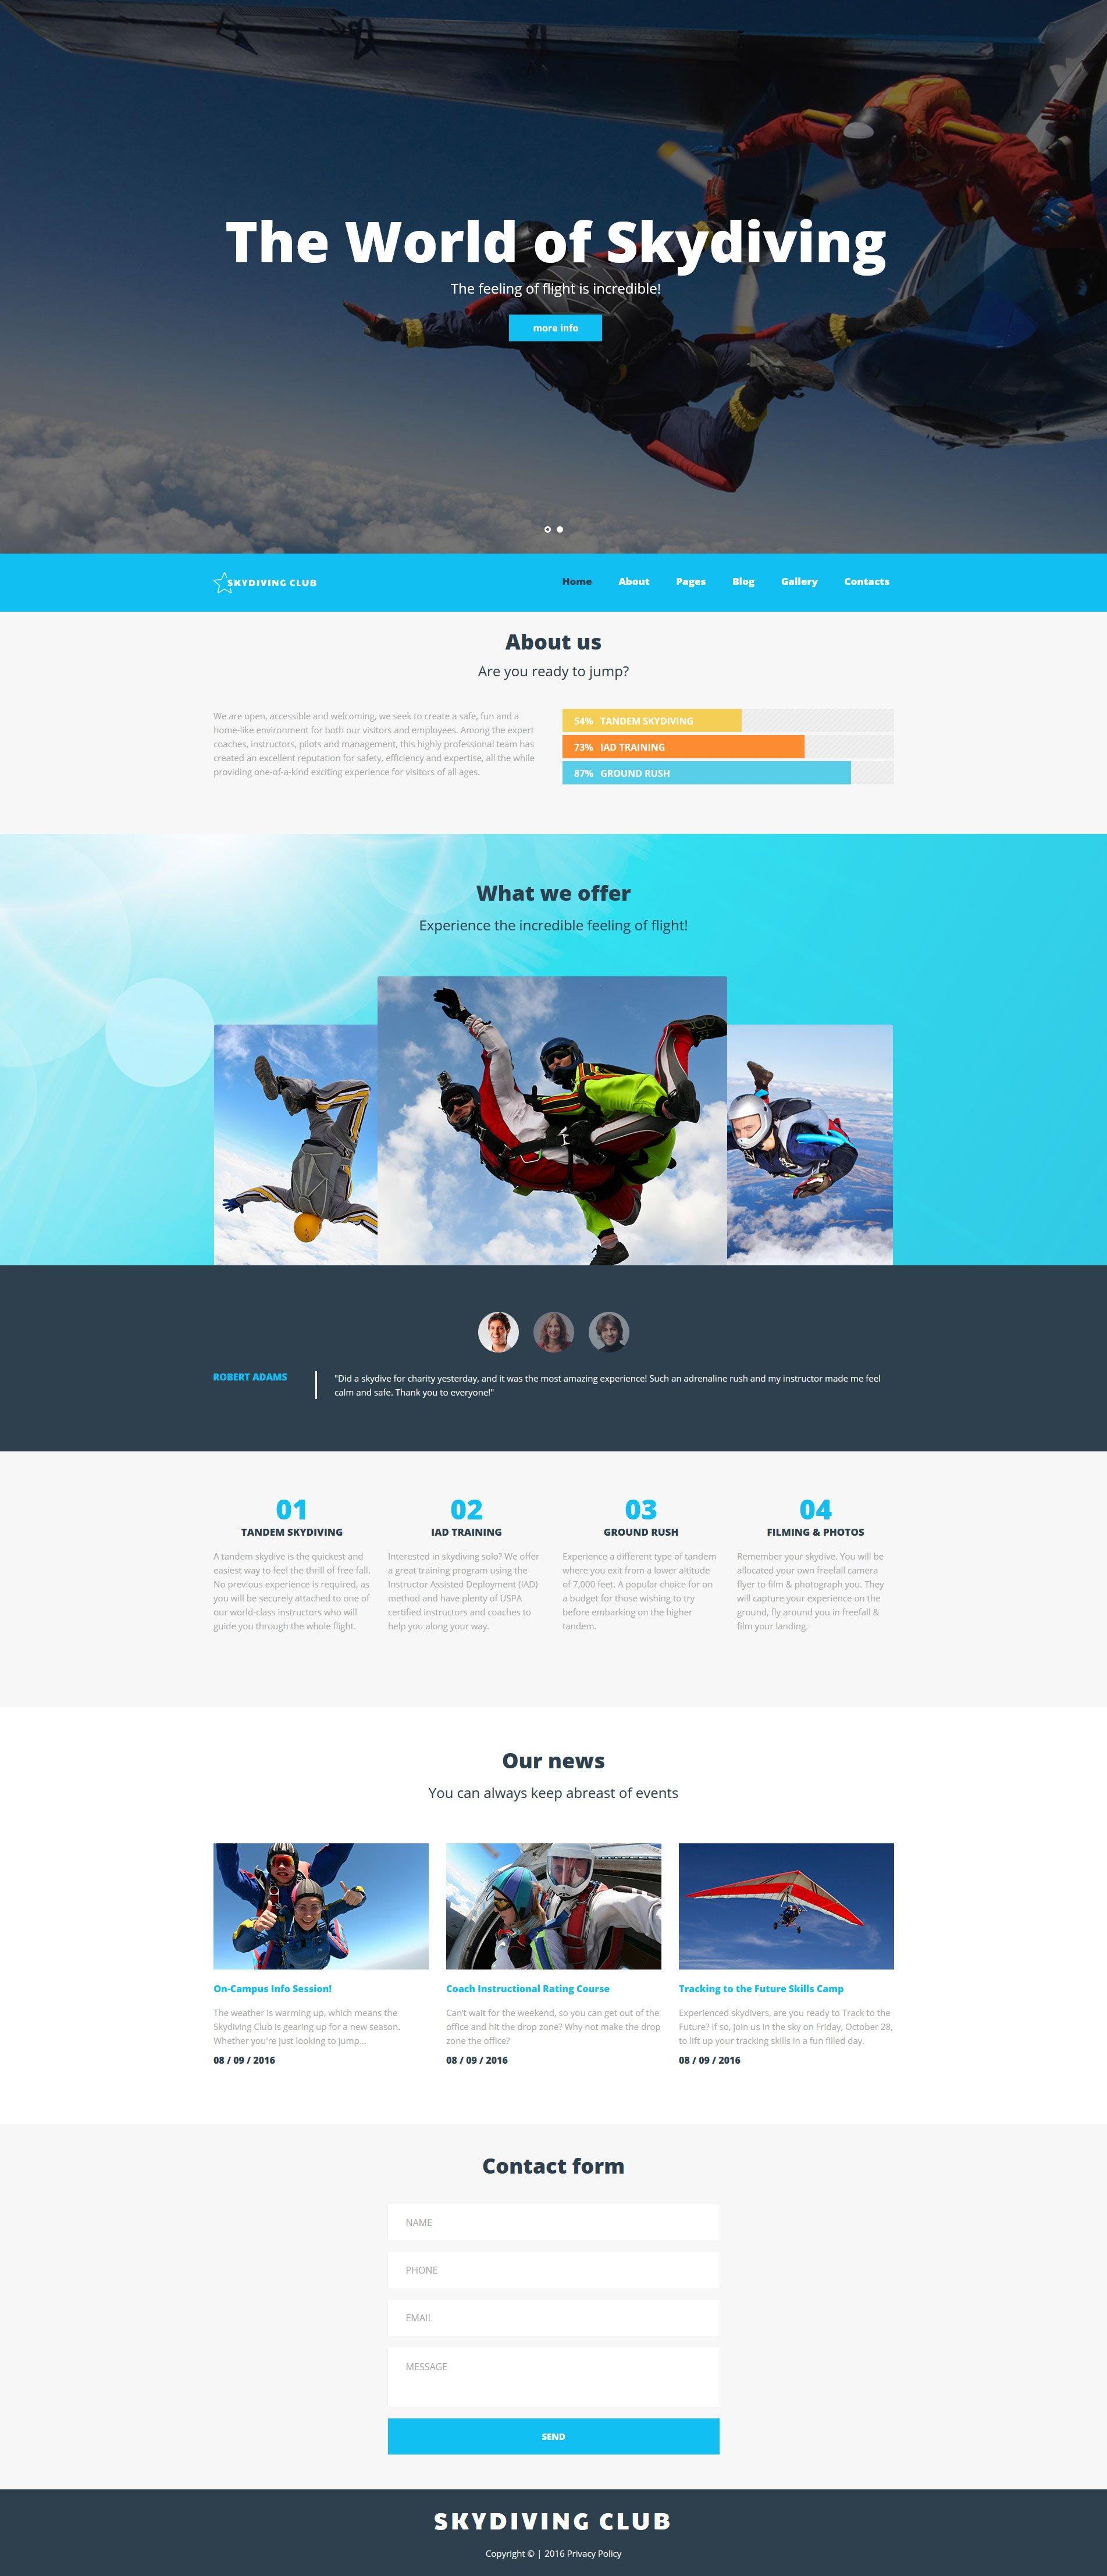 Skydiving Club - Extreme Sports & Skydiving Club Joomla Template - screenshot